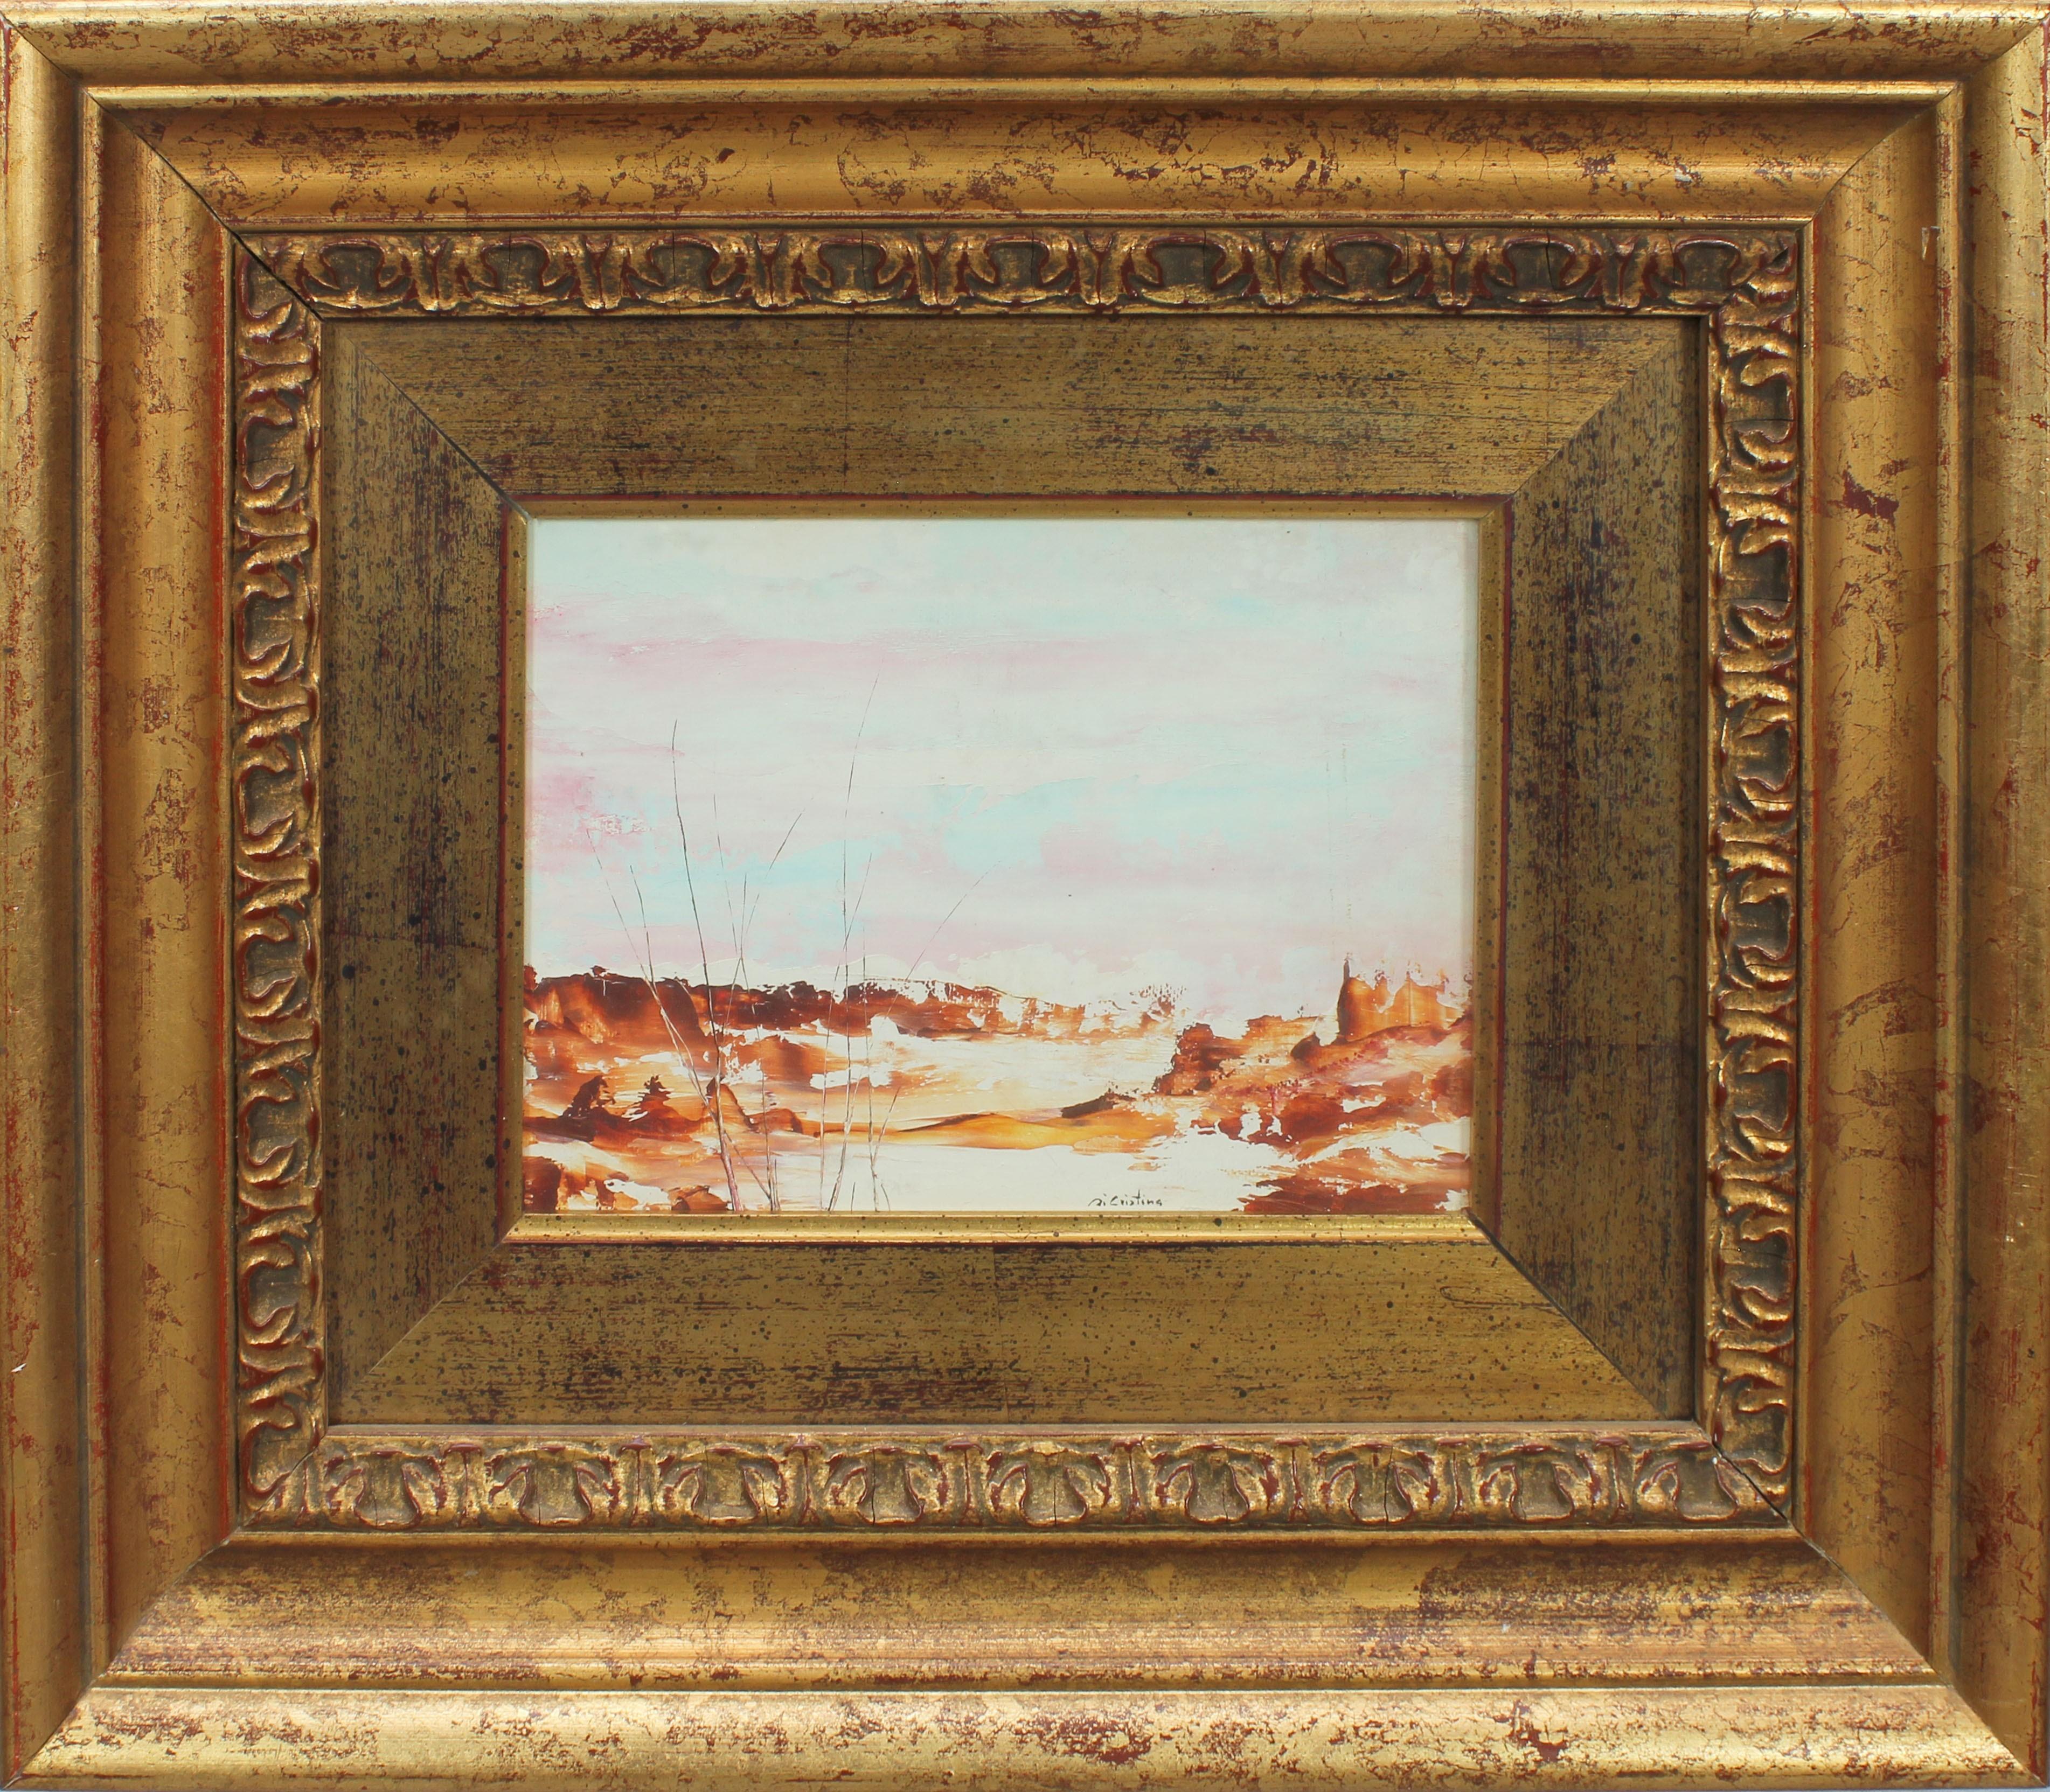 Lot 51 - Paesaggio, a firma di Cristina, tecnica mista, cm. 20x14